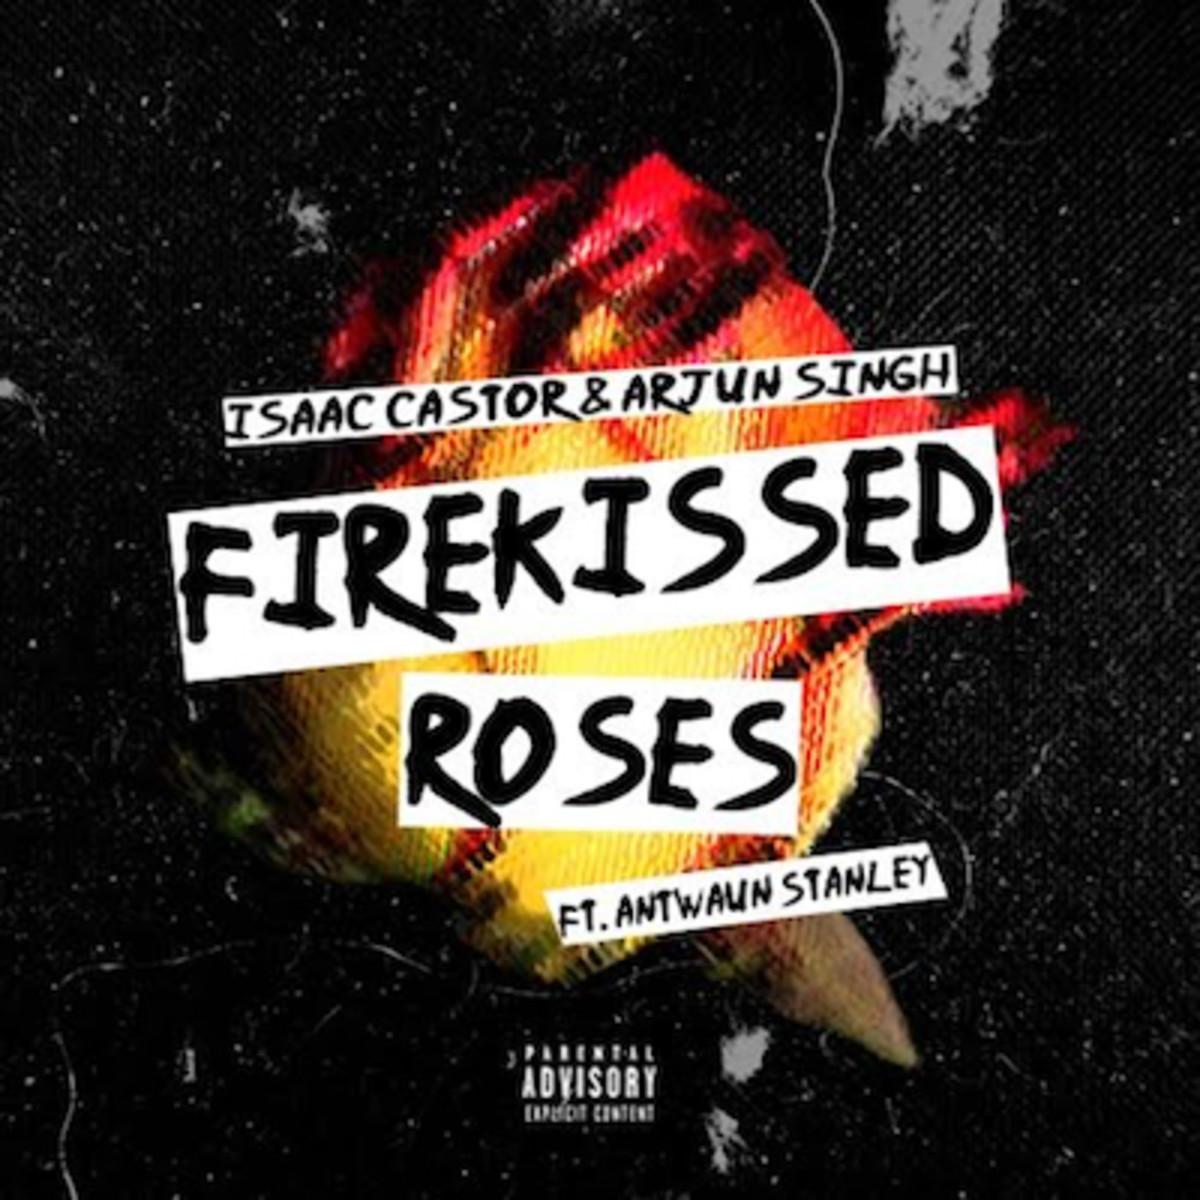 isaac-castor-firekissed-roses.jpg